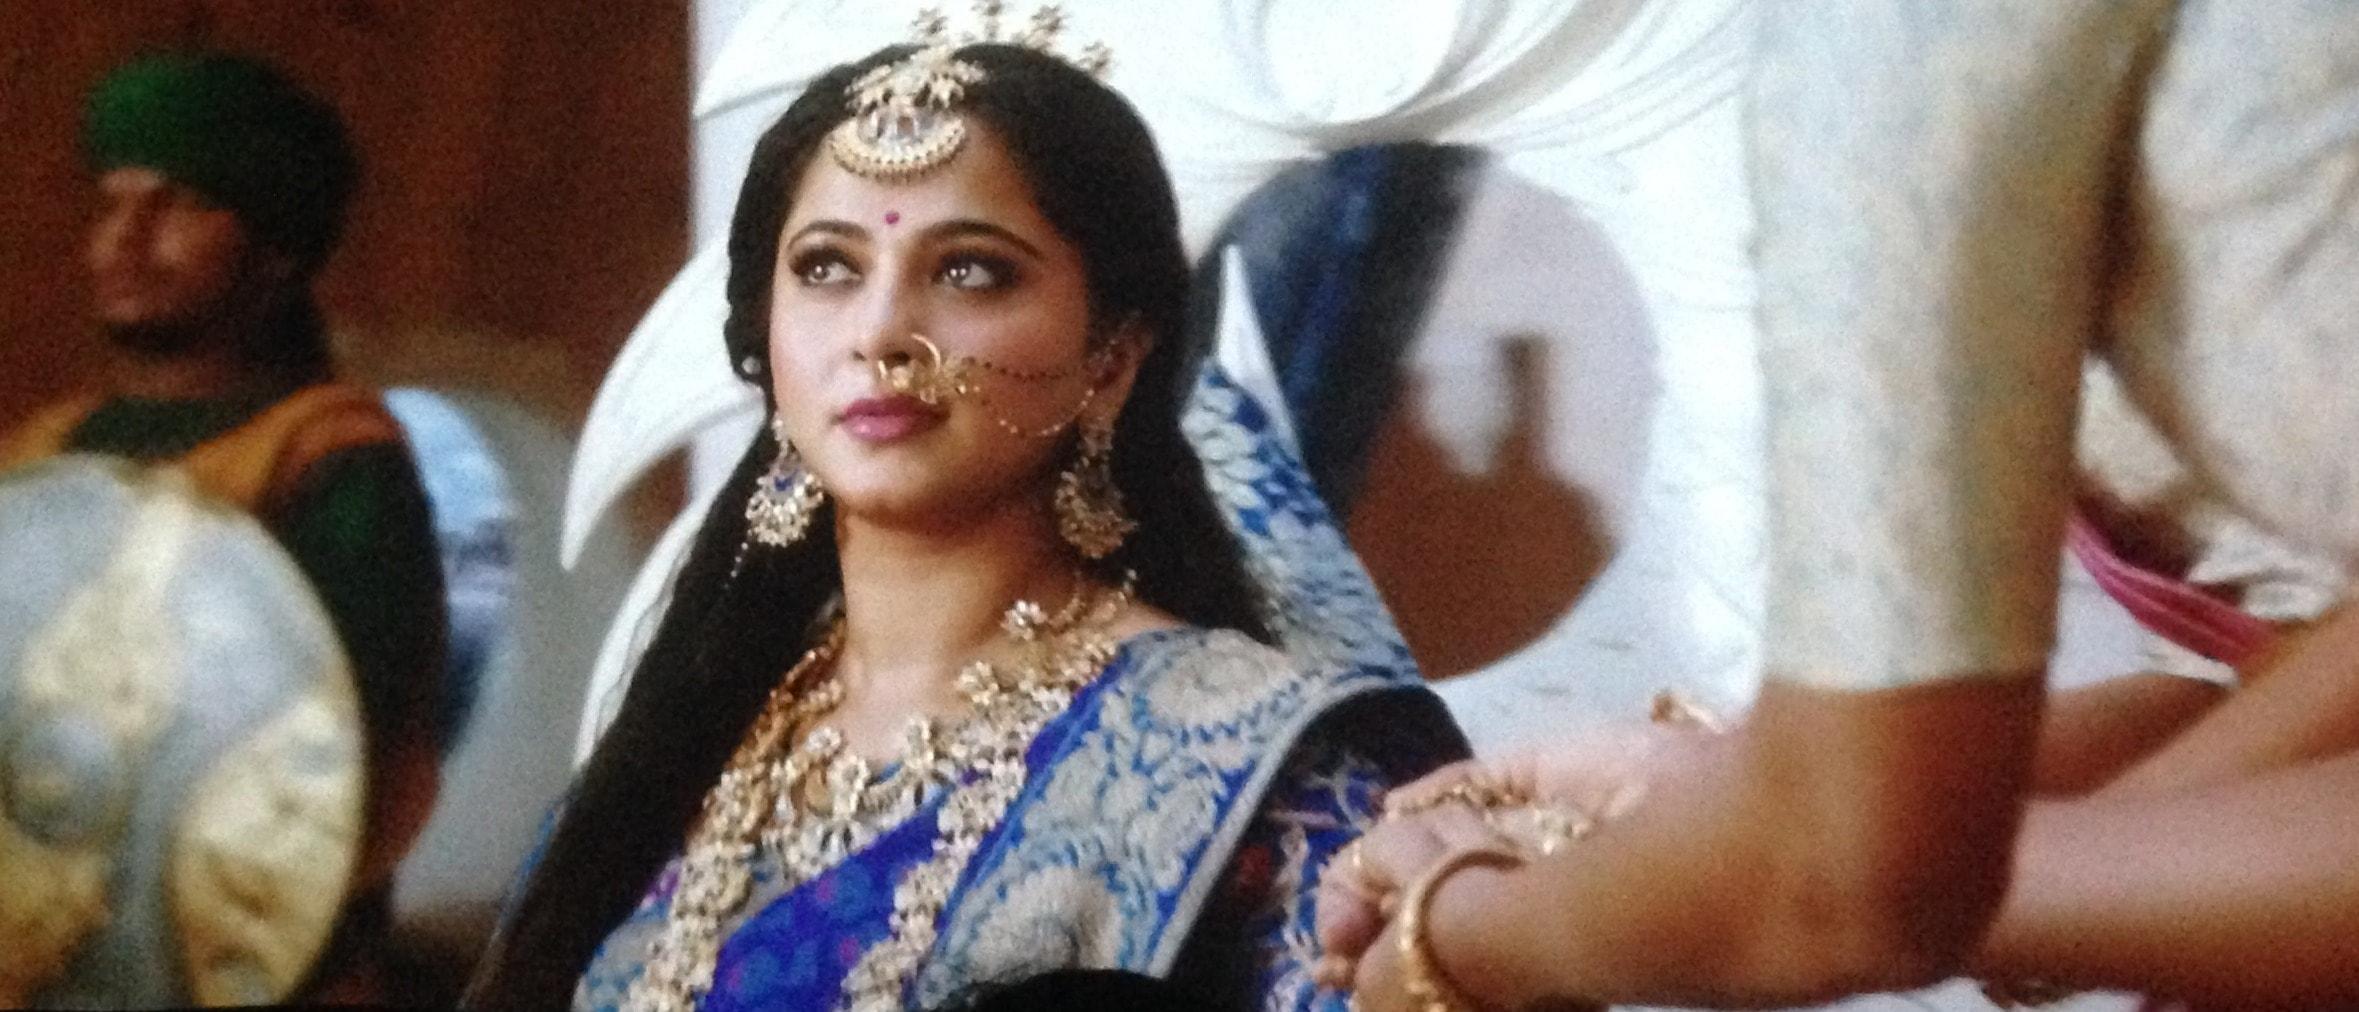 anushka shetty goddess looks is charismatic in bahubali 2